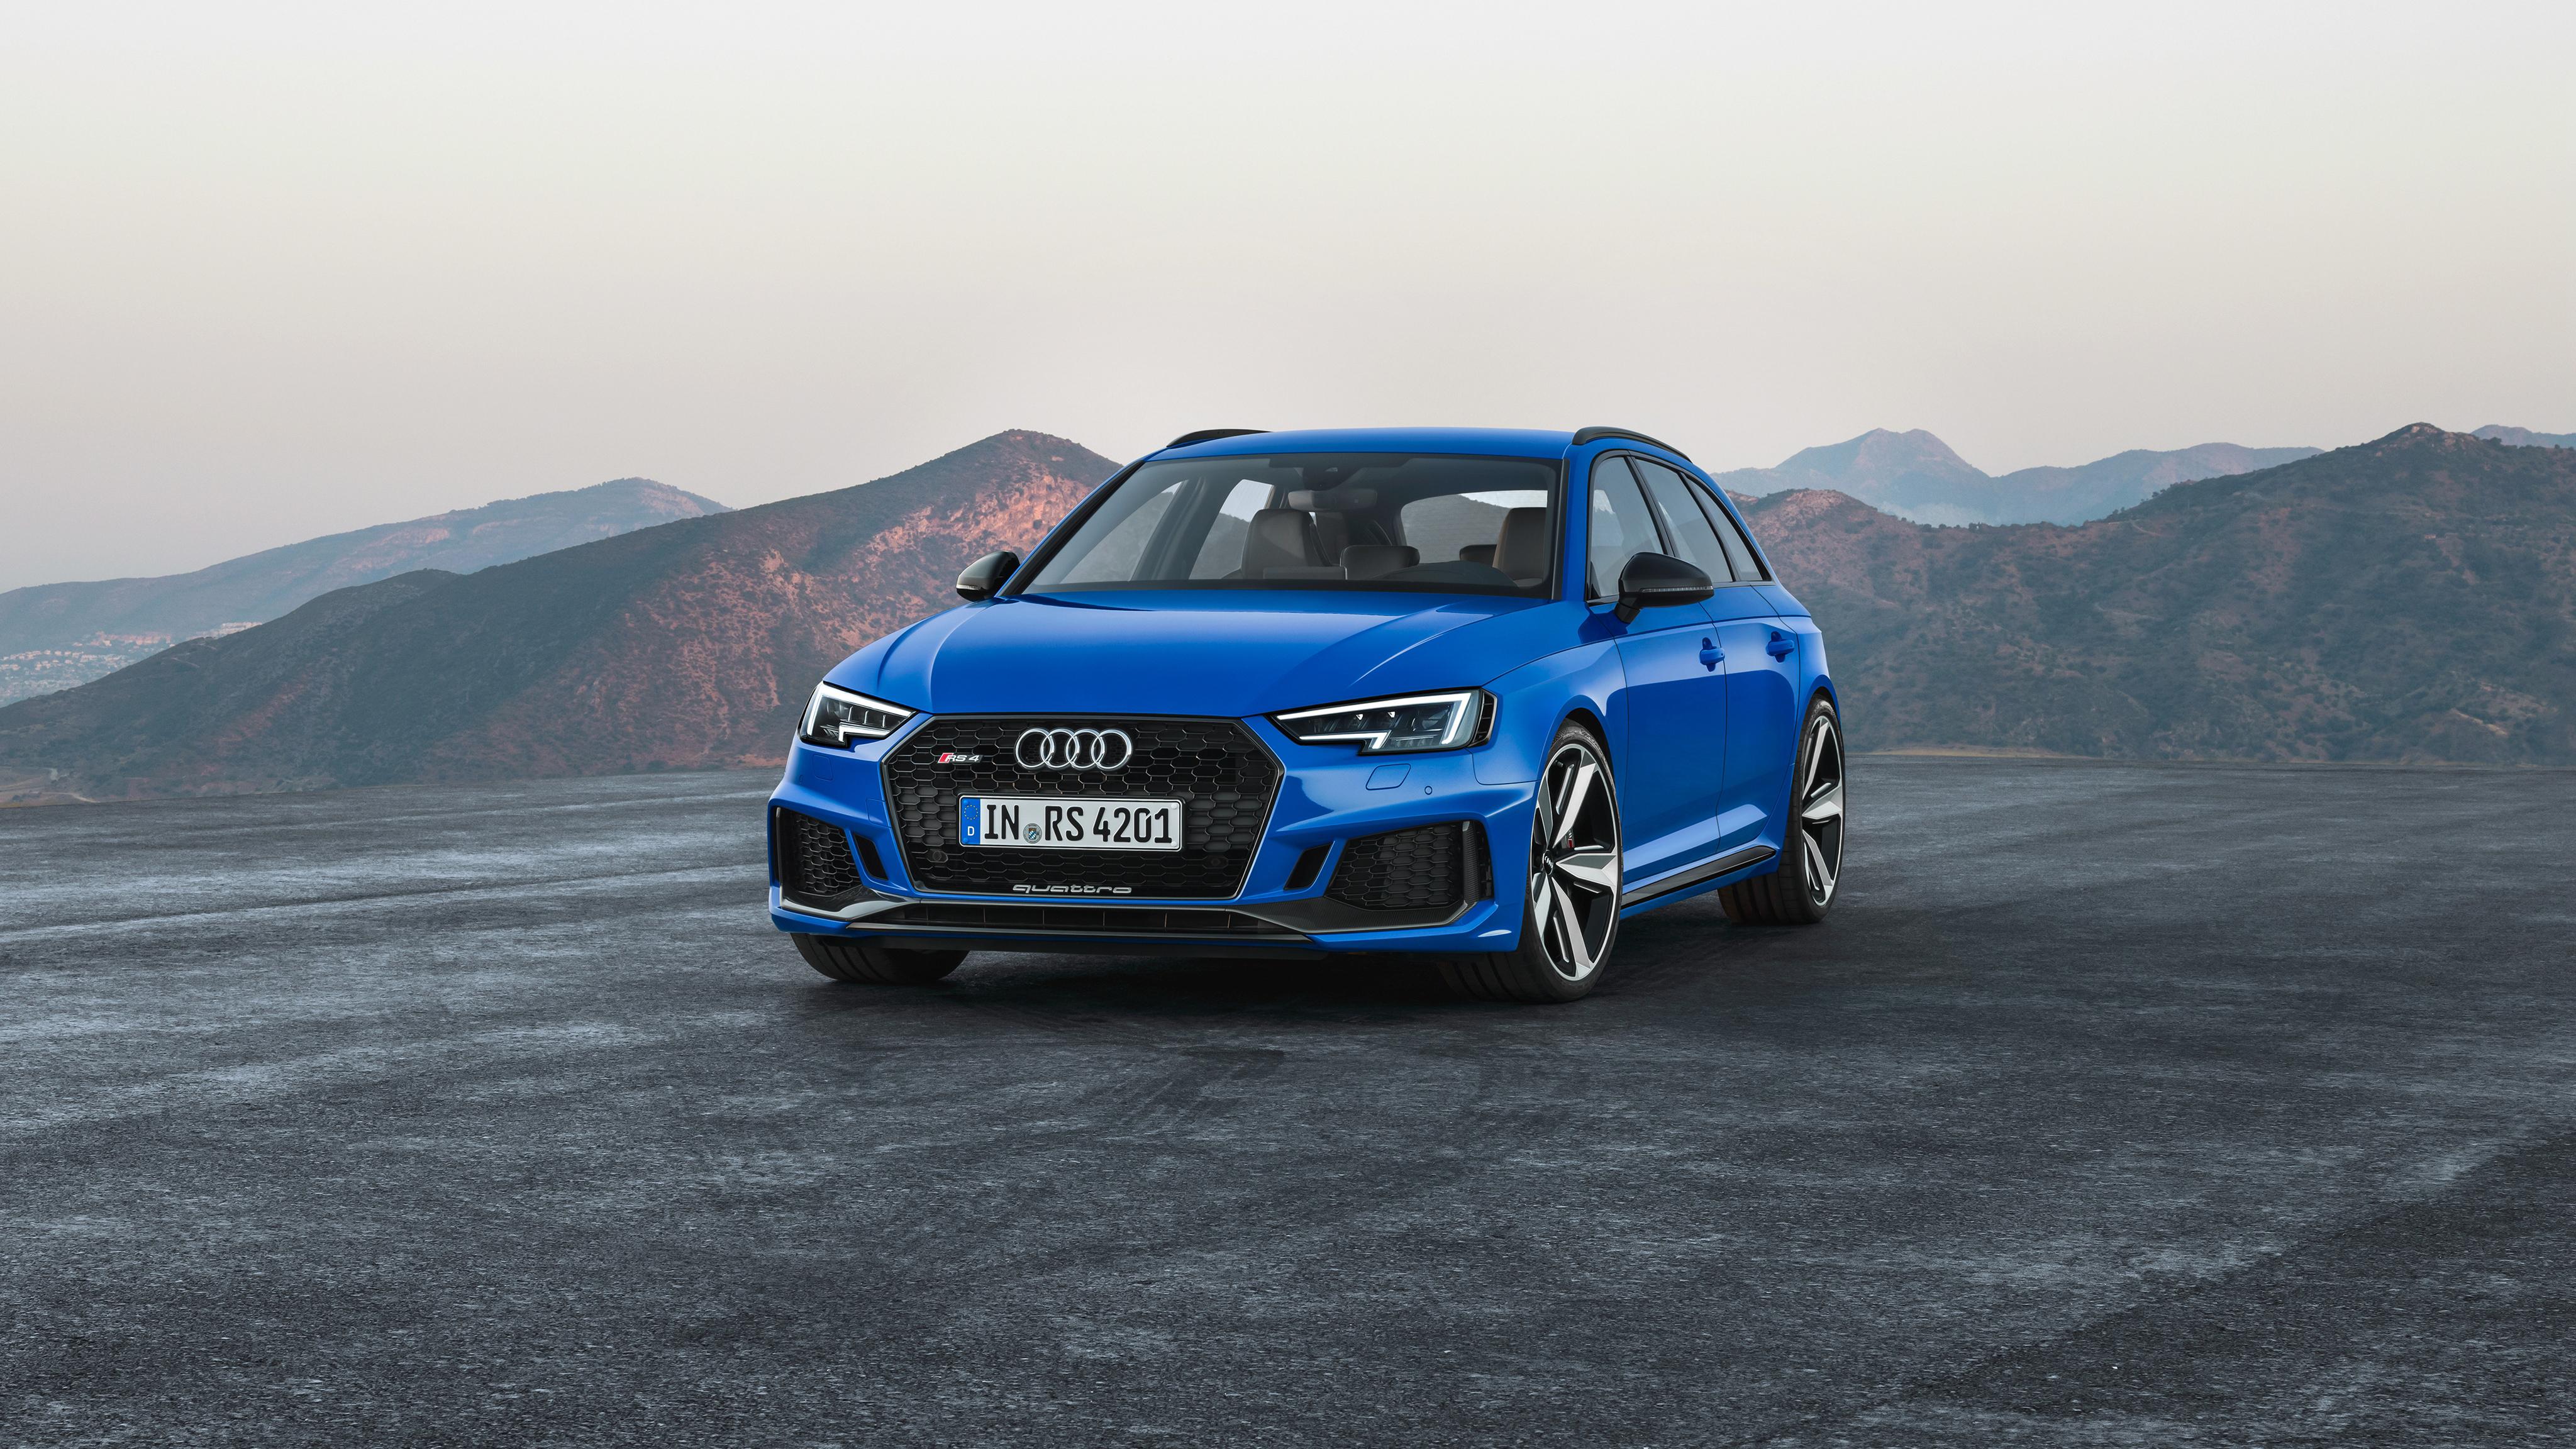 2018 Audi Rs4 Avant 4k Wallpaper Hd Car Wallpapers Id 8587